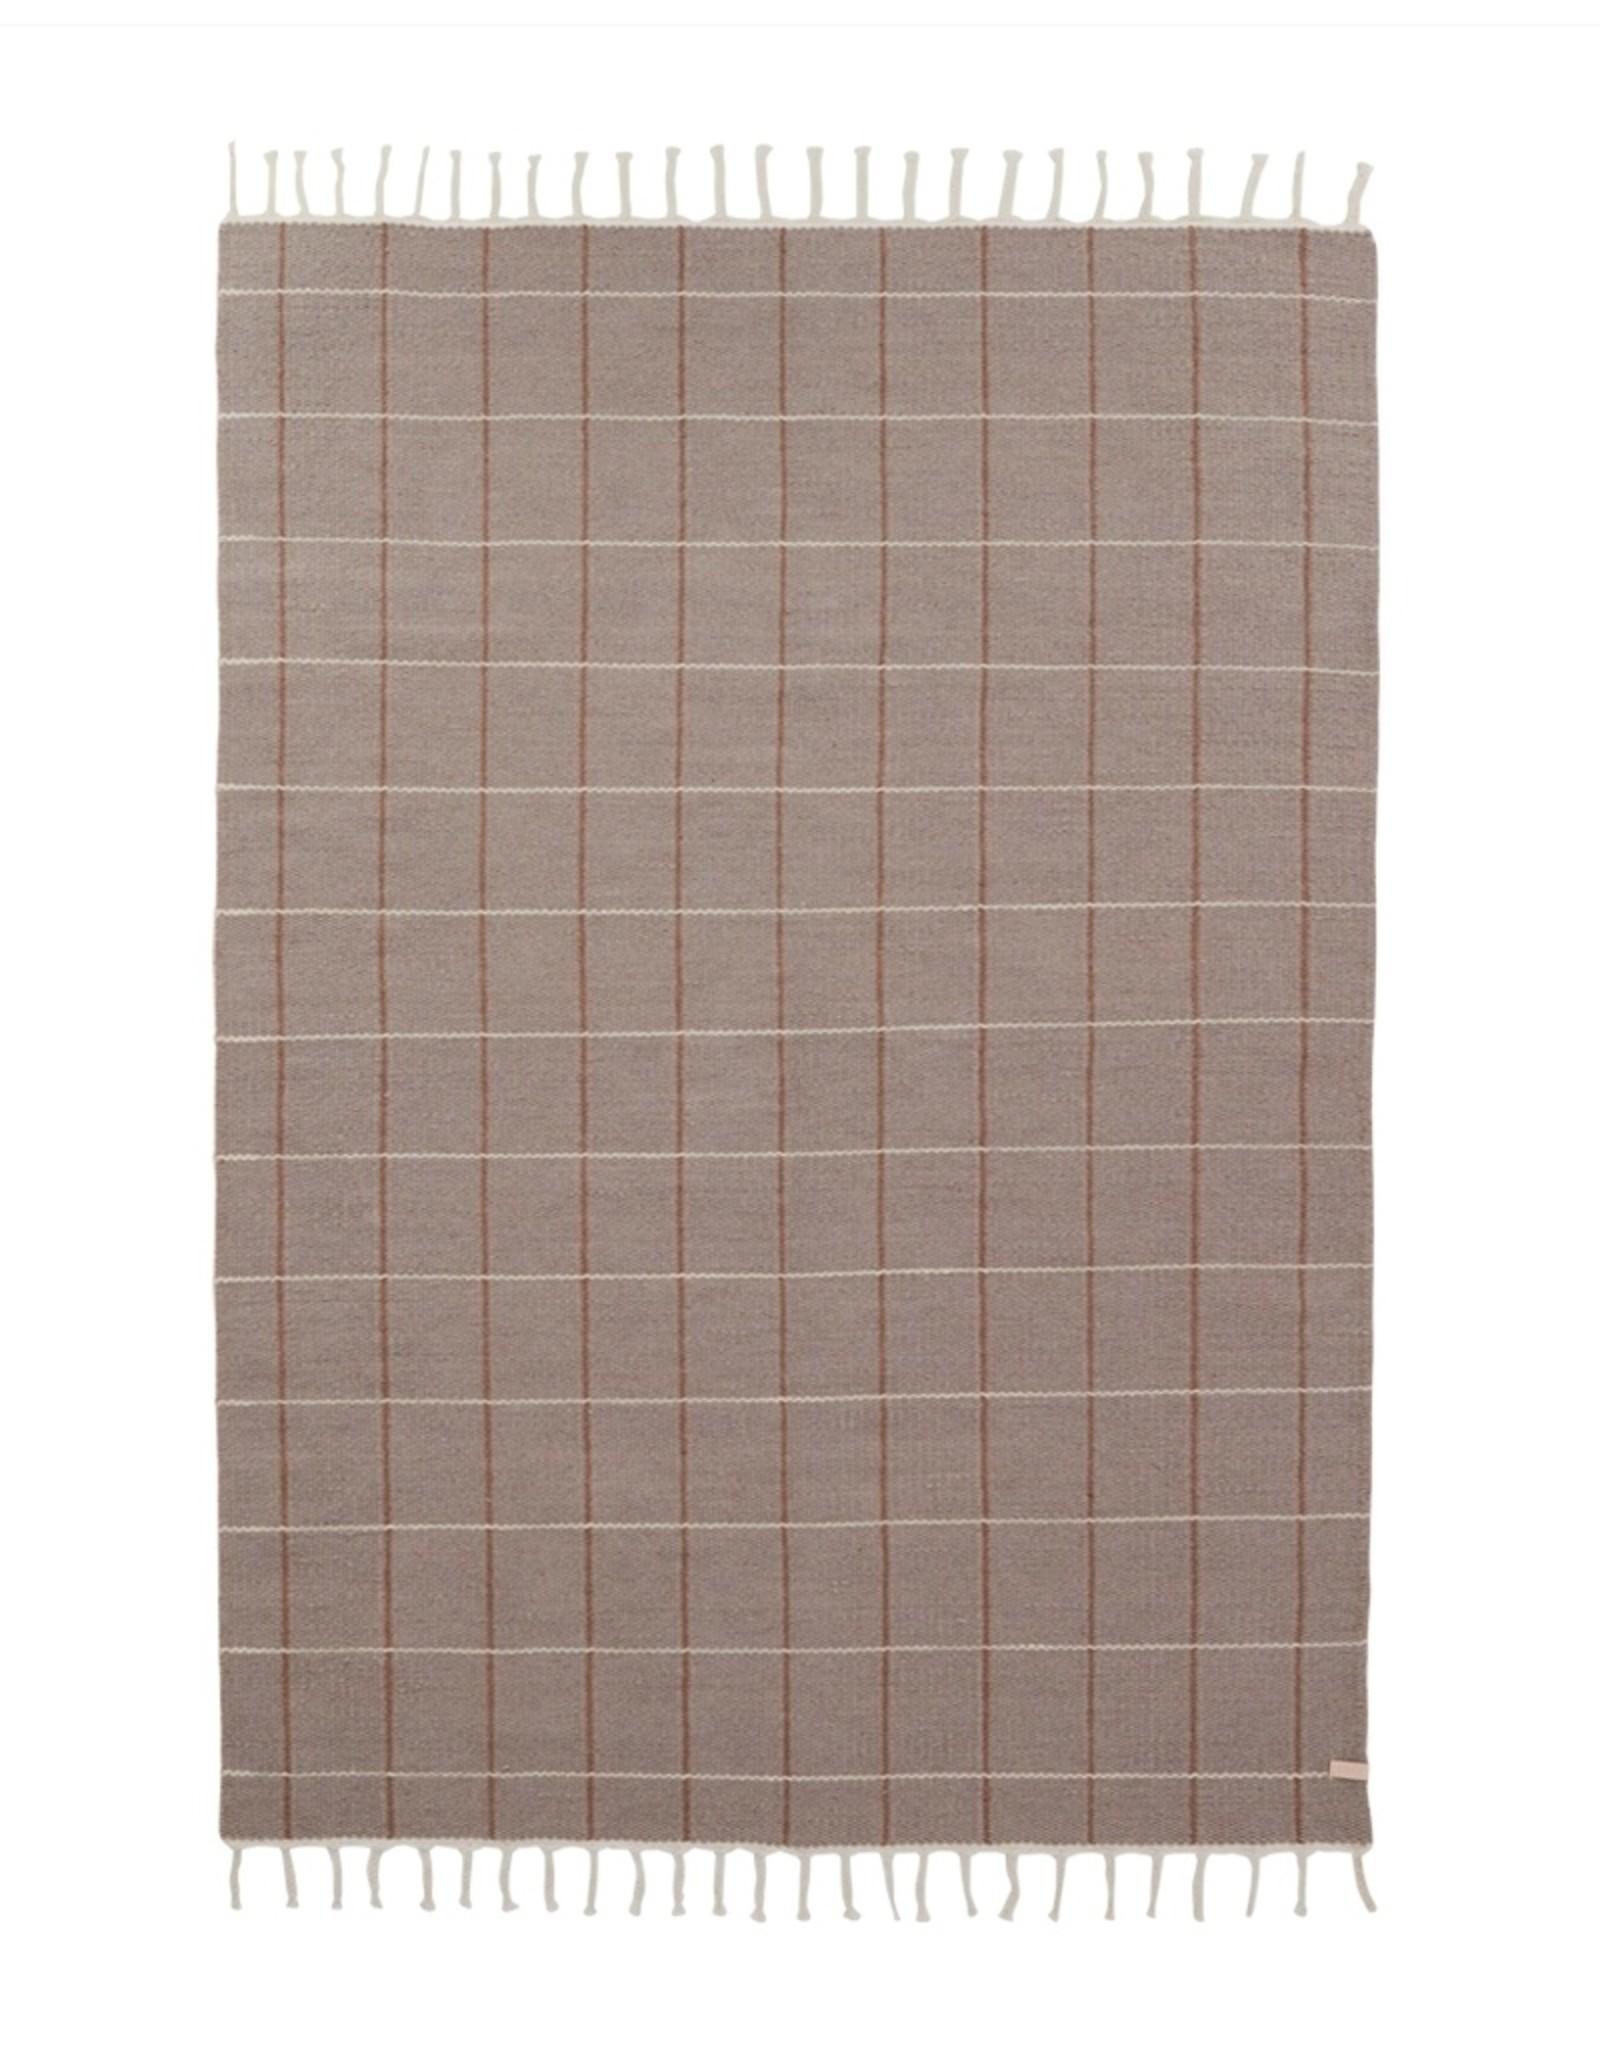 OYOY 'Grid' vloerkleed 140x200cm